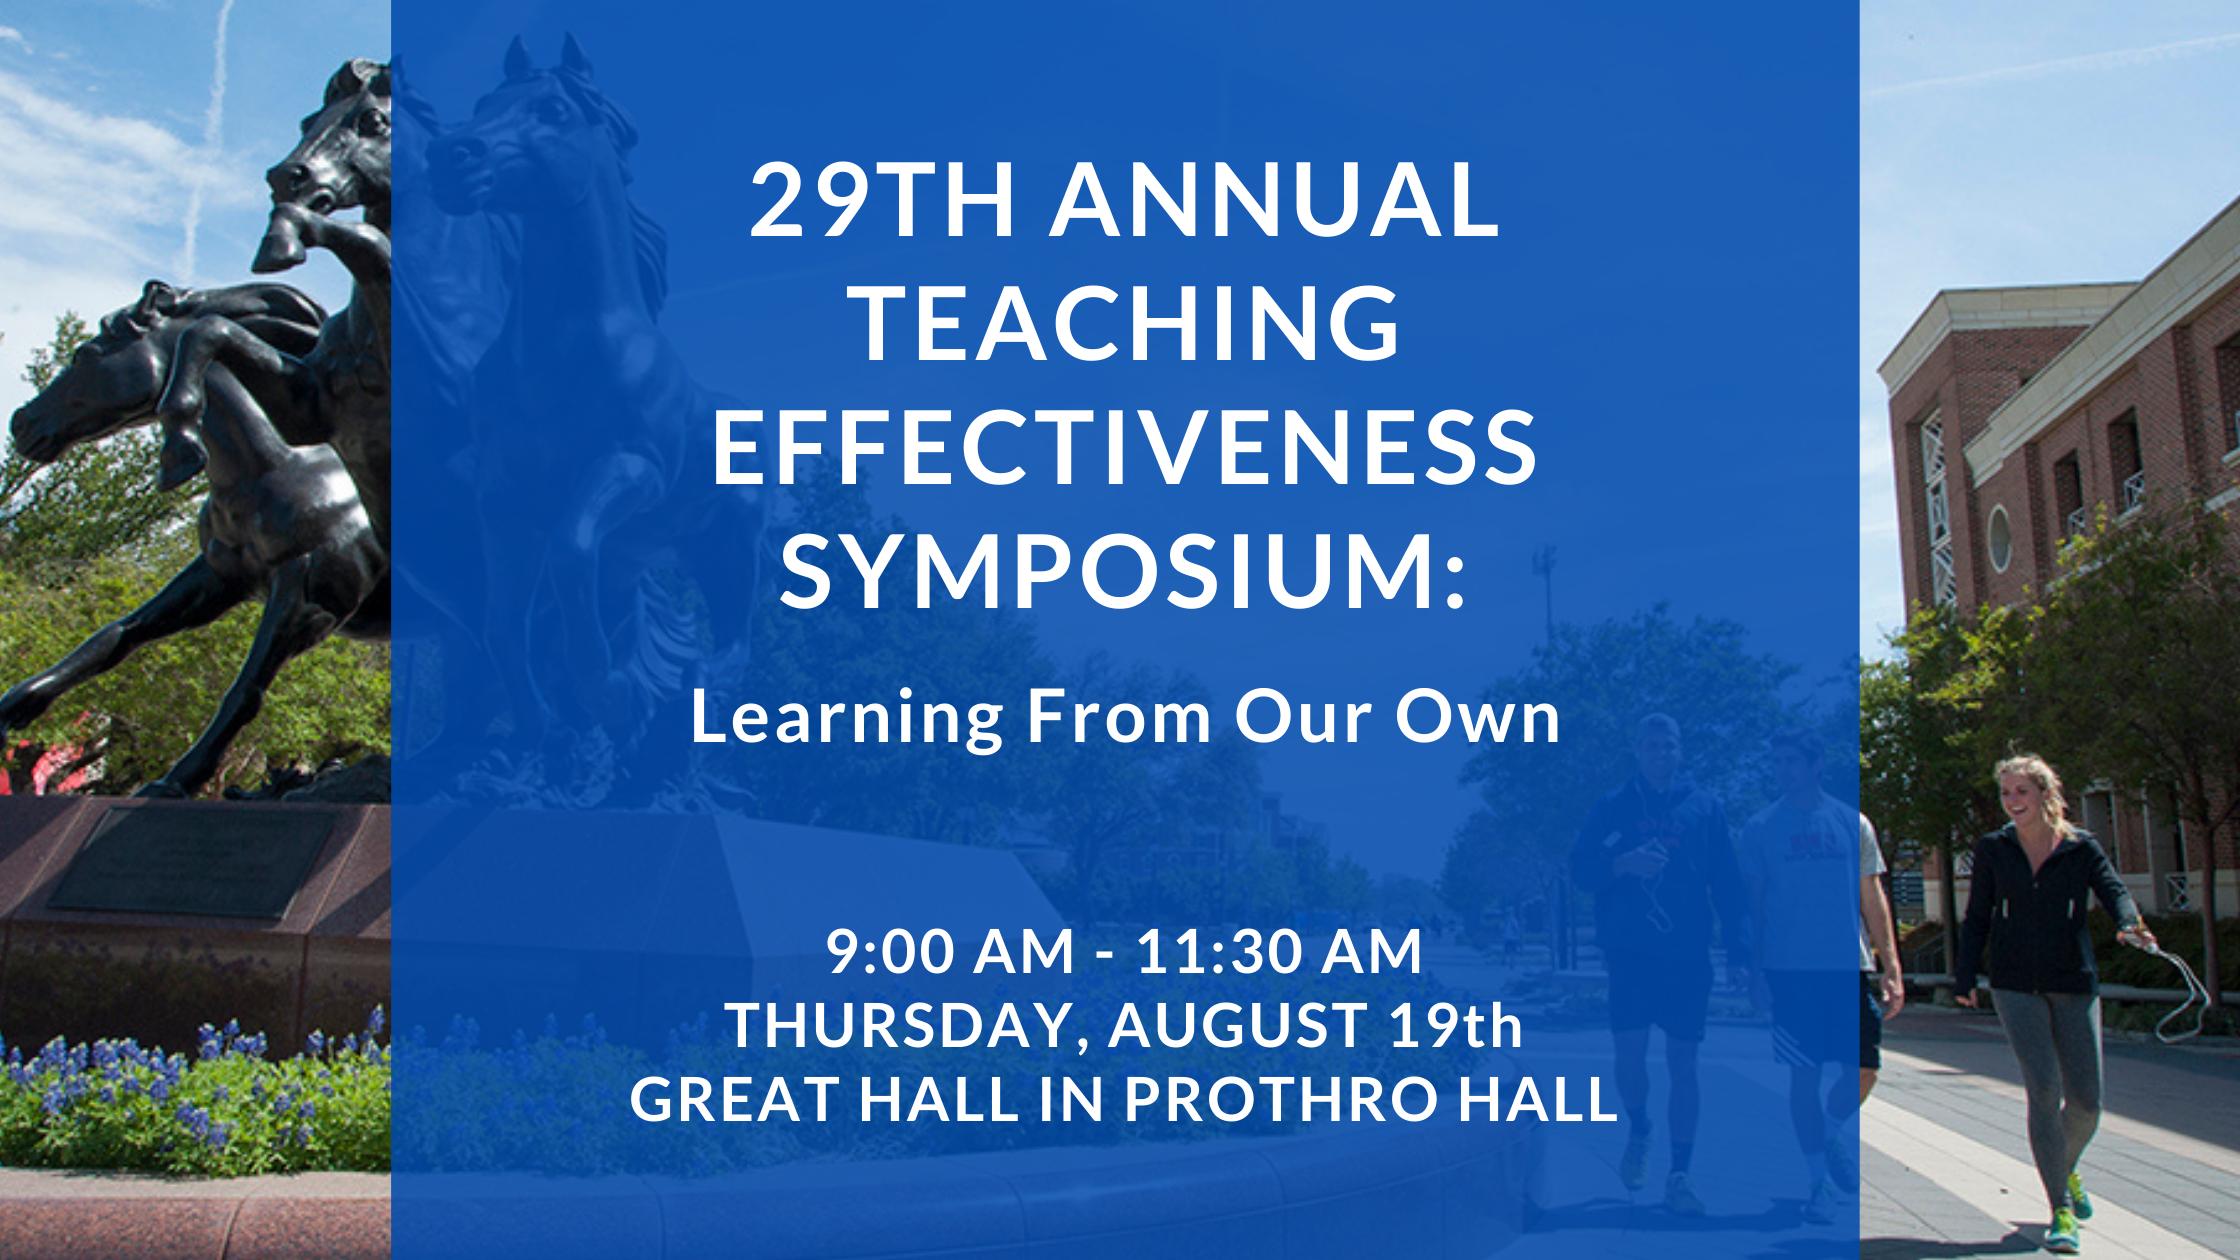 Teaching Effectiveness Symposium